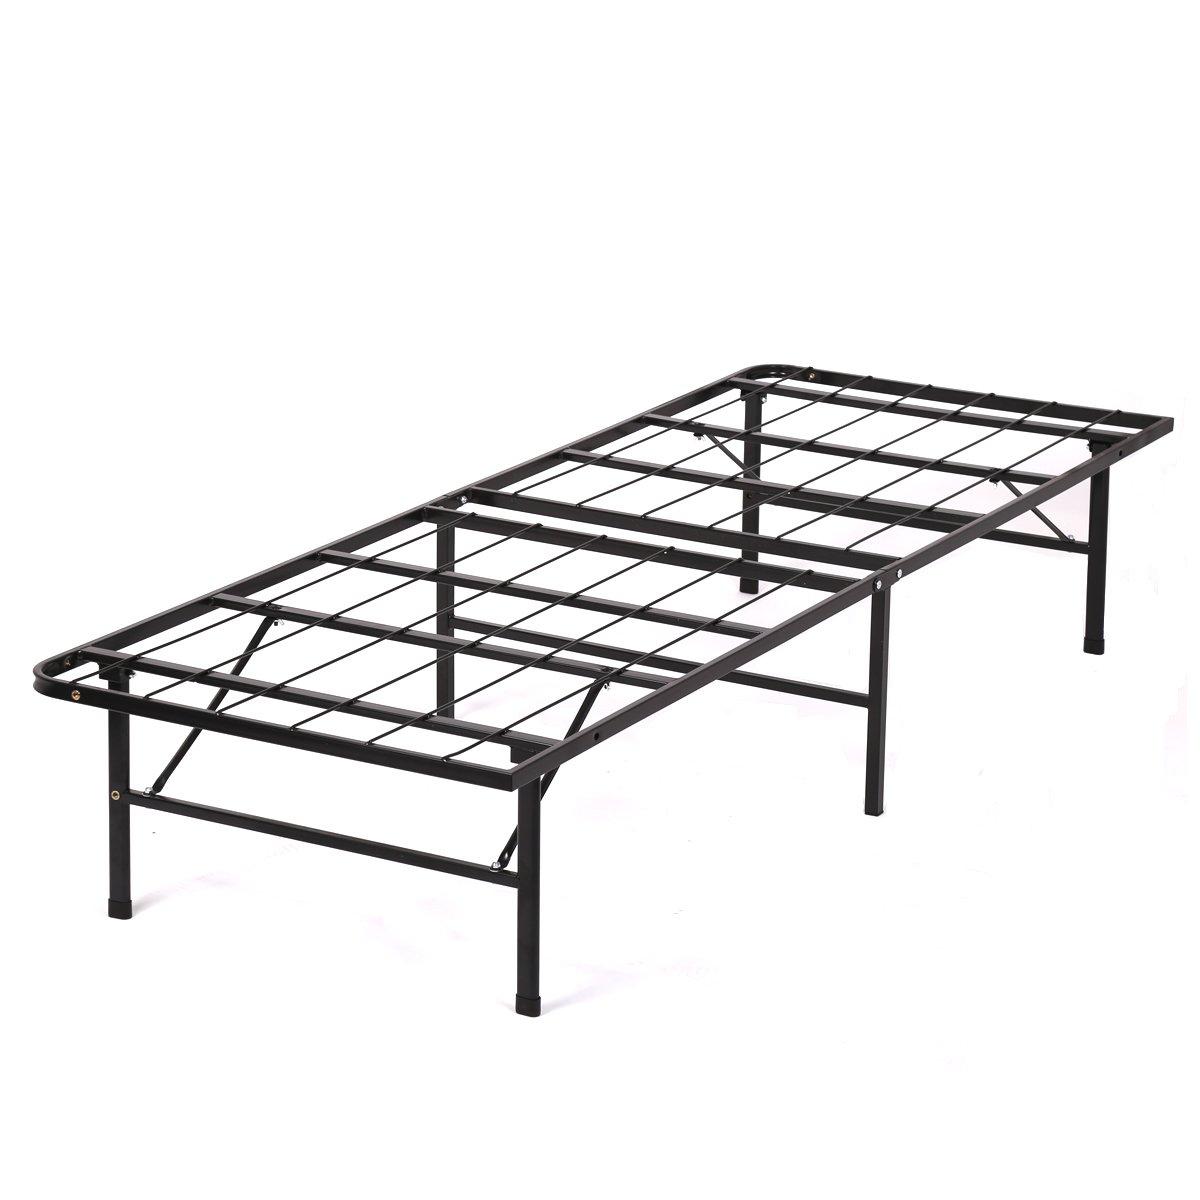 PayLessHere Bed Frame Bi-Fold Twin Folding Platform Metal Bed Frame Mattress Foundation